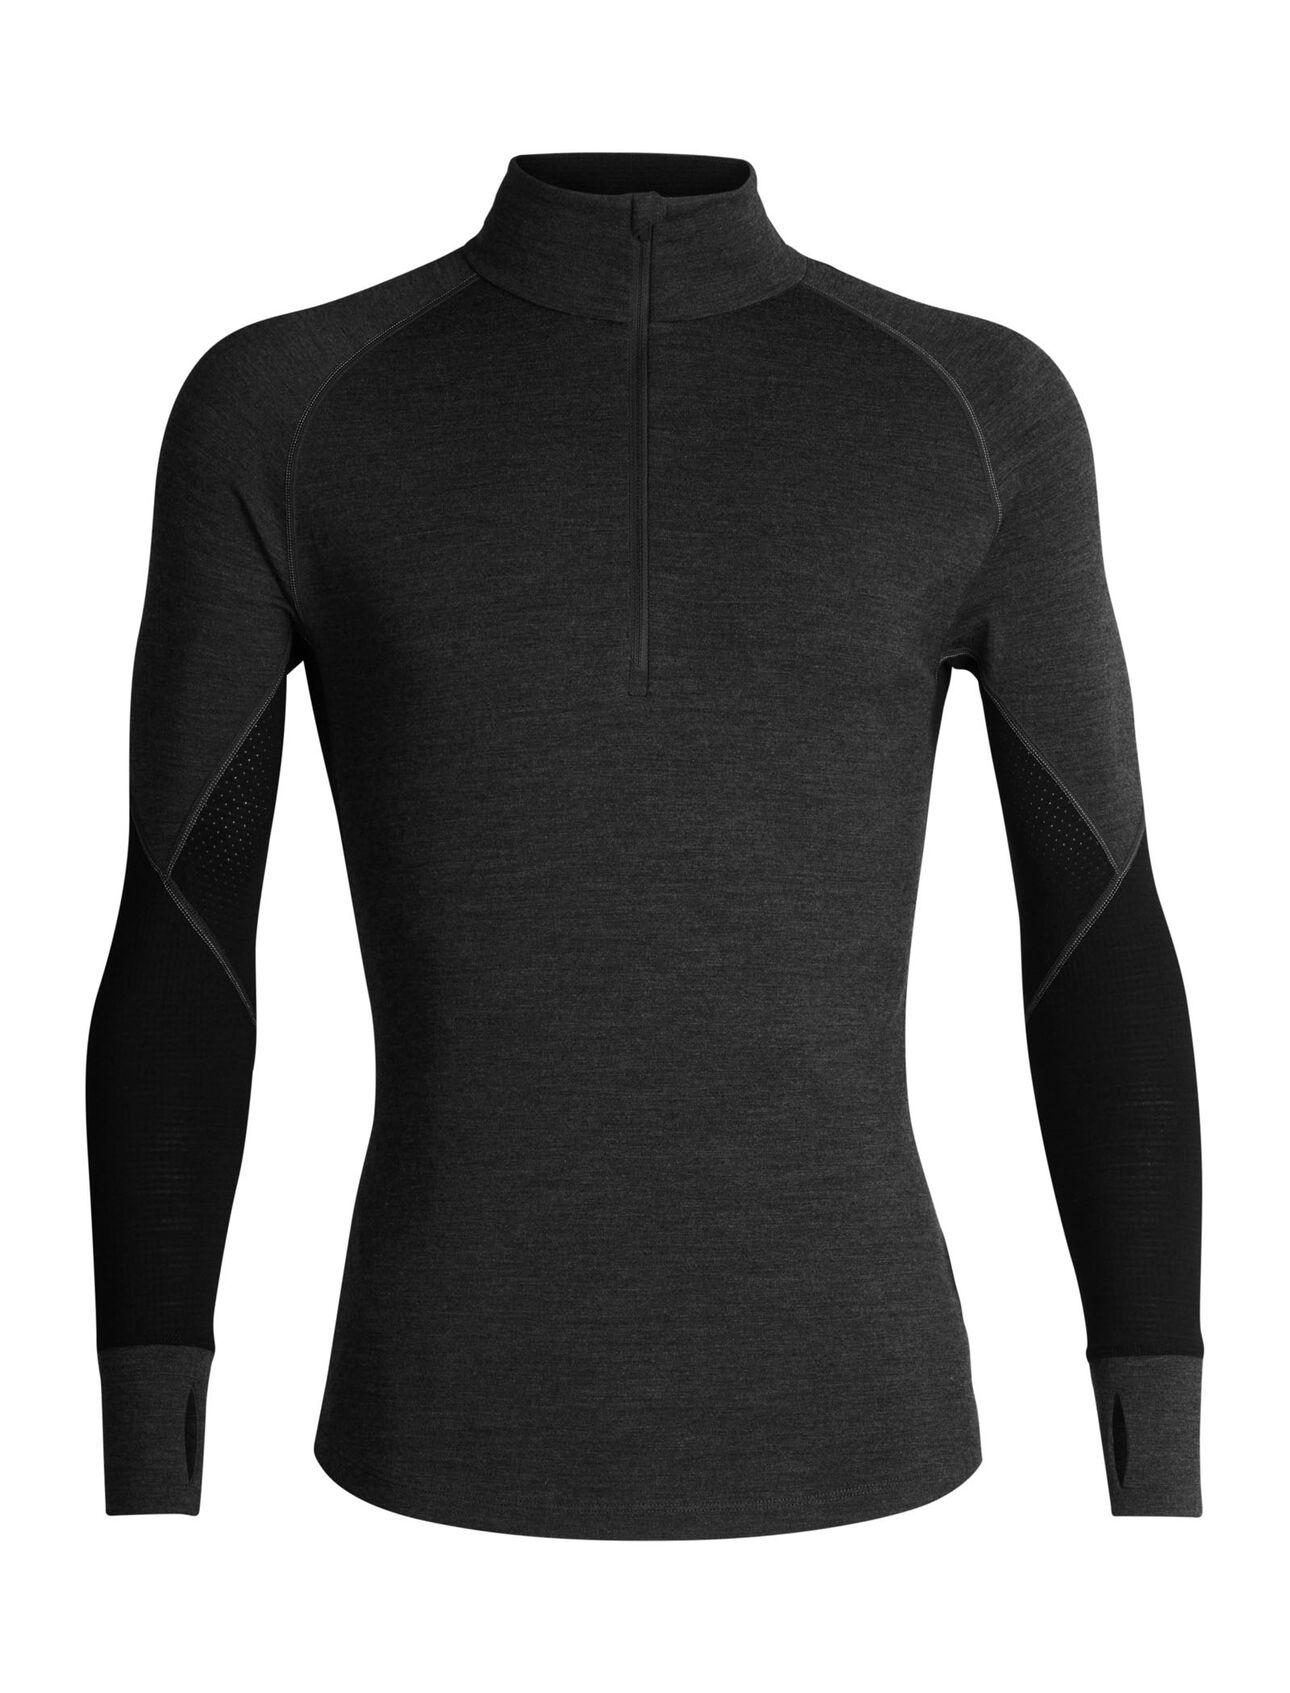 BodyfitZone™ Merino 260 Zone Long Sleeve Half Zip Thermal Top